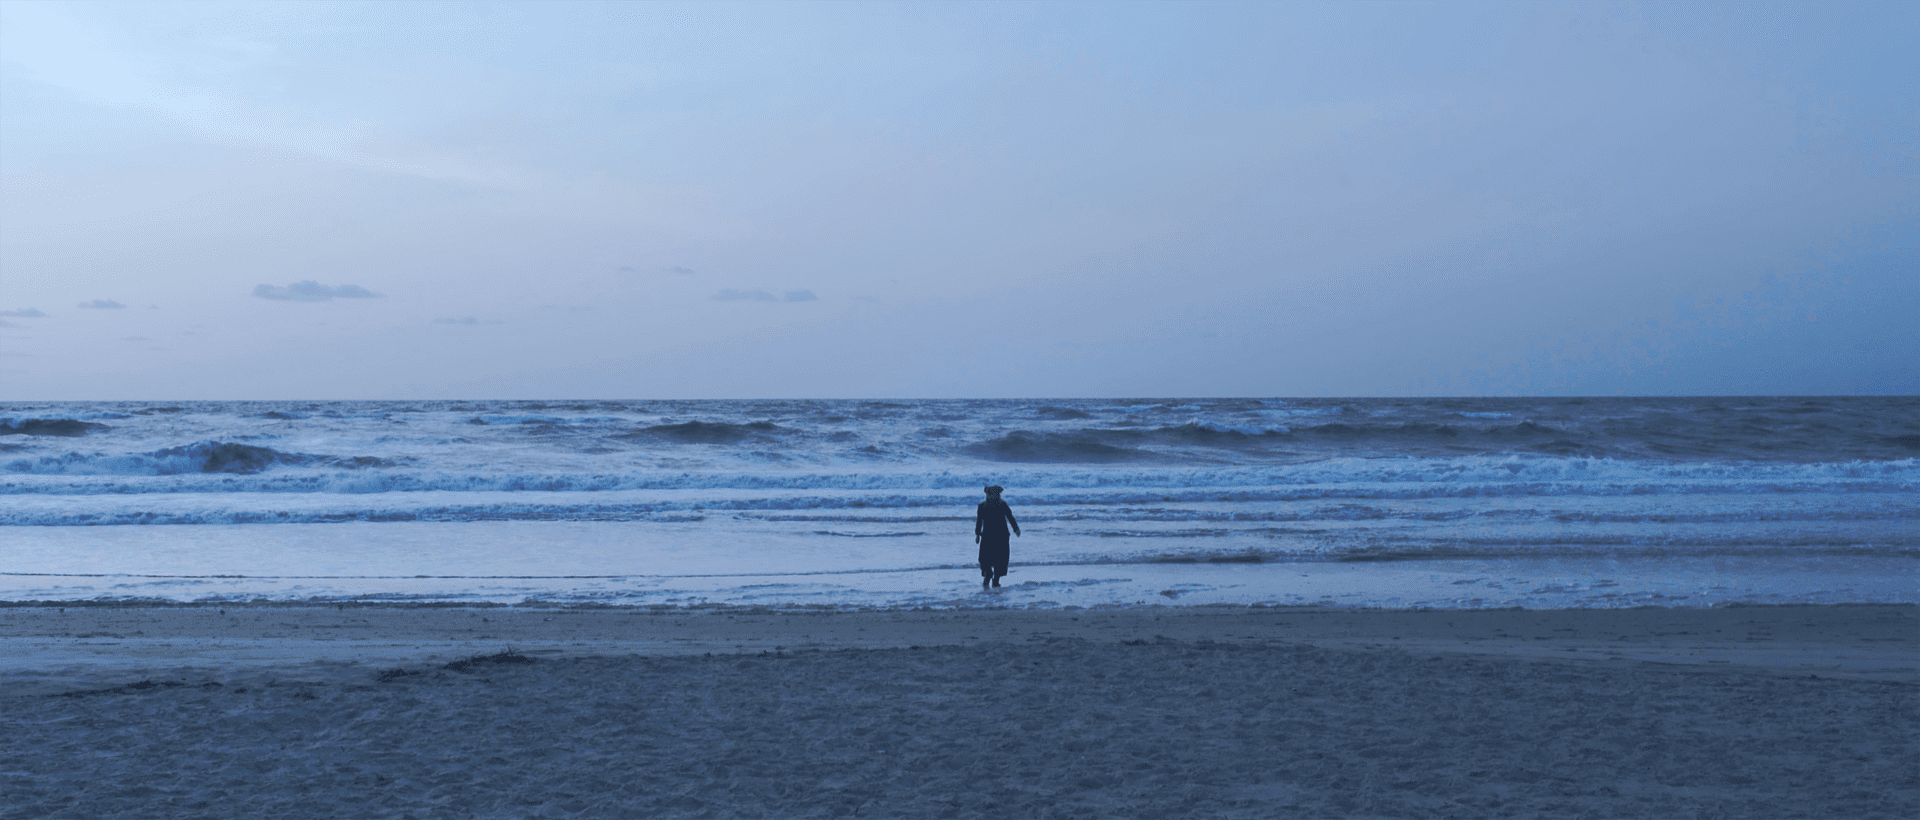 son of blackbeard shipwrecked short film thomas verdi